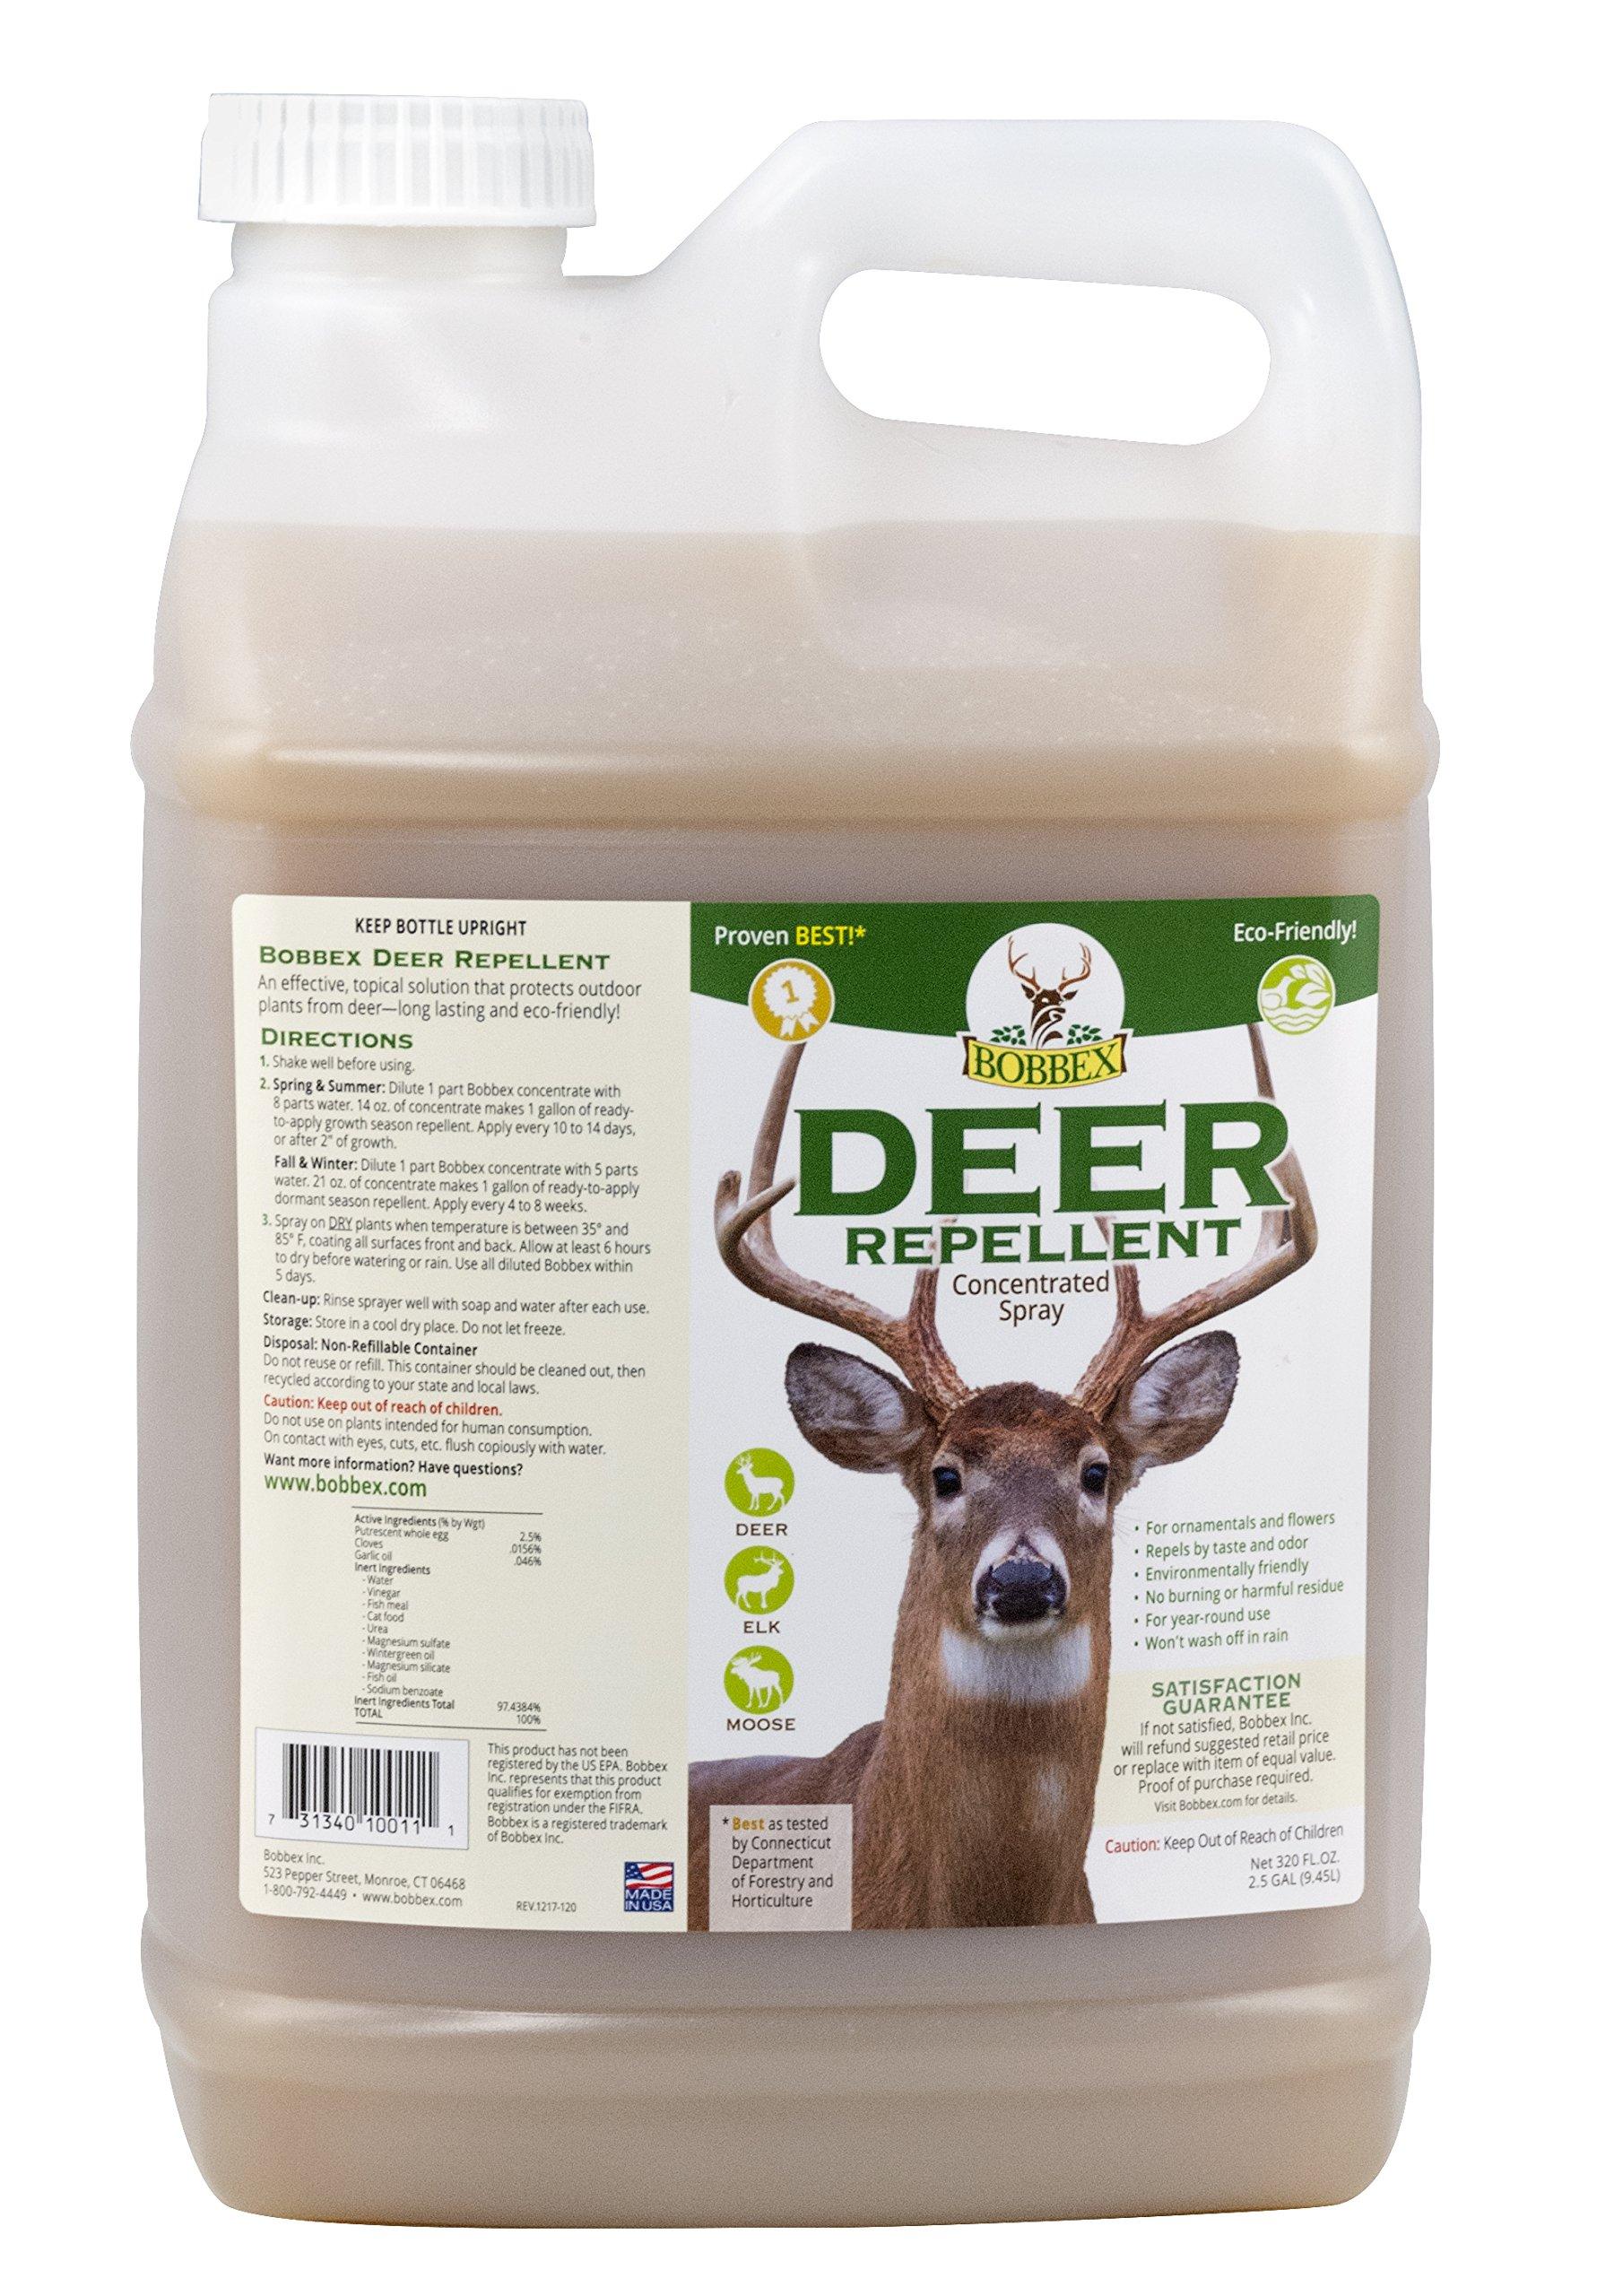 Bobbex Repellent Gallon Concentrated Spray